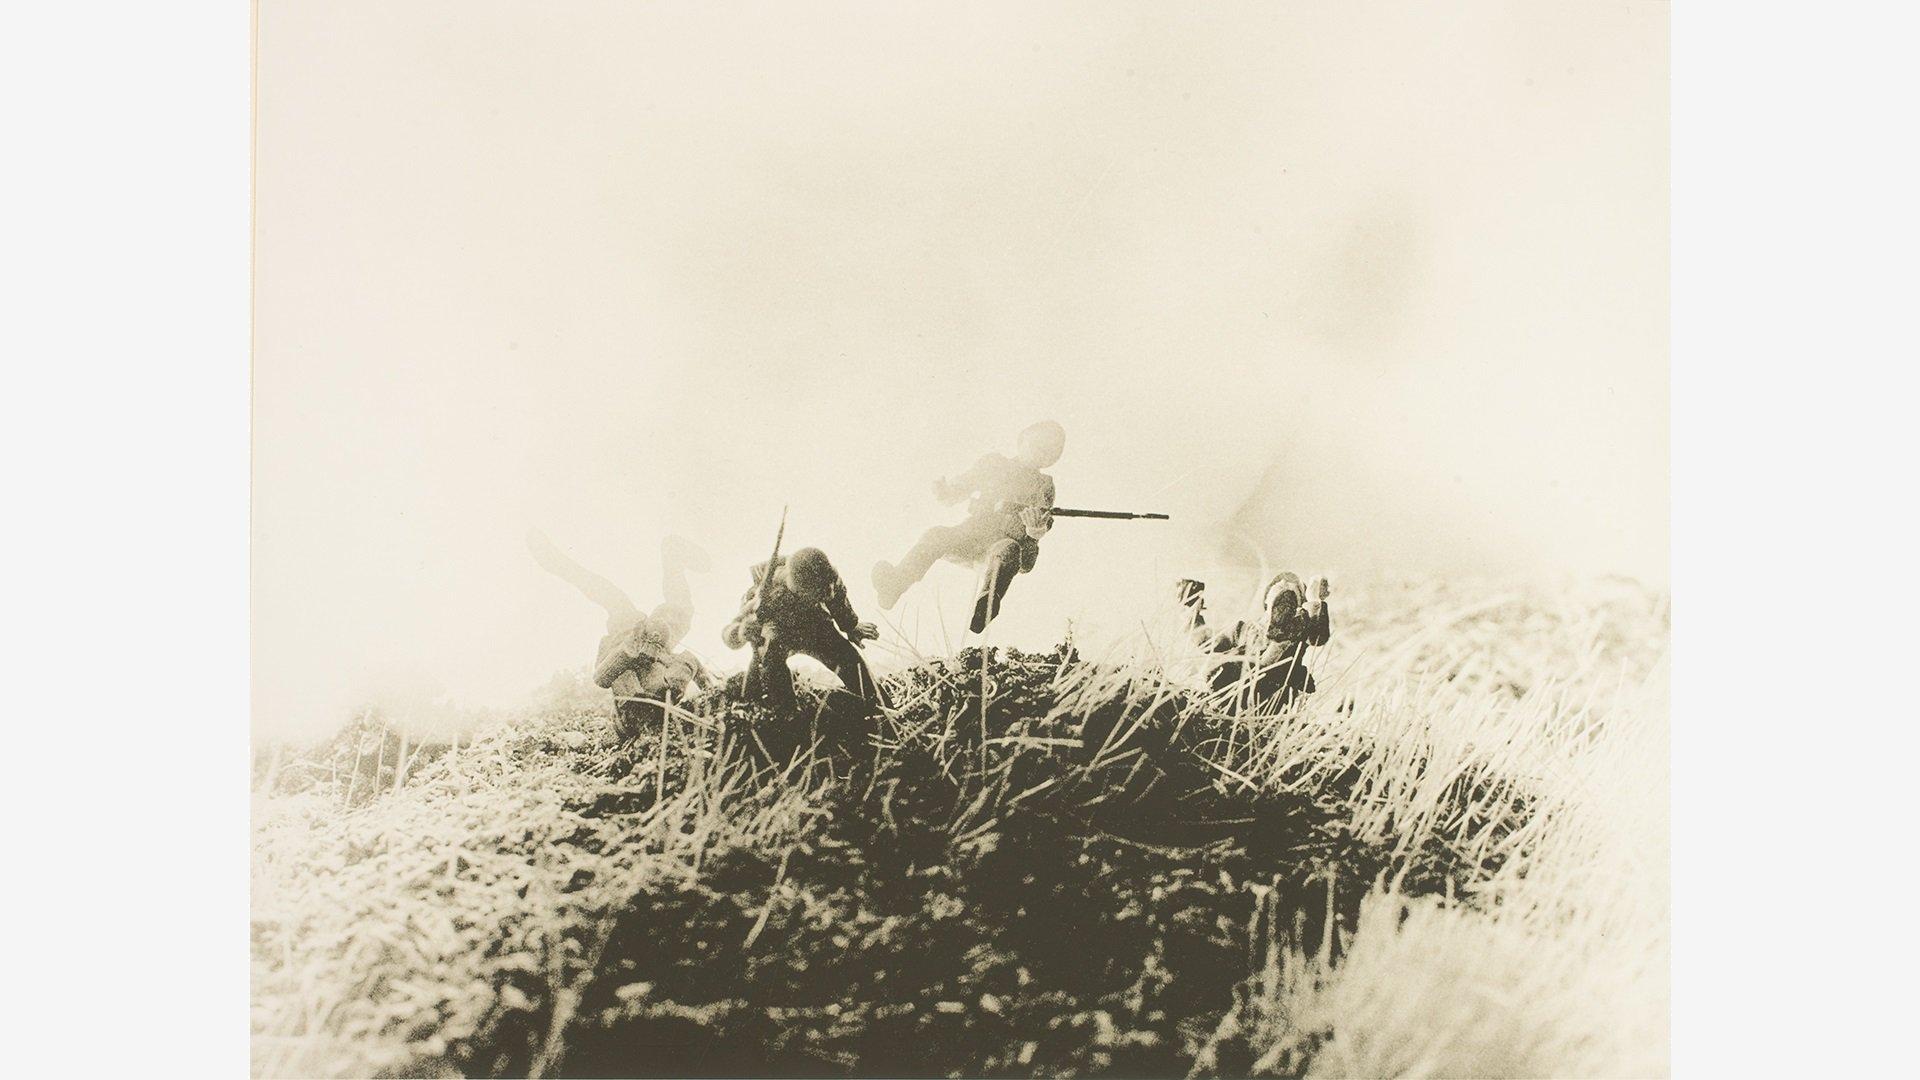 © DAVID LEVINTHAL: WAR, MYTH, DESIRE